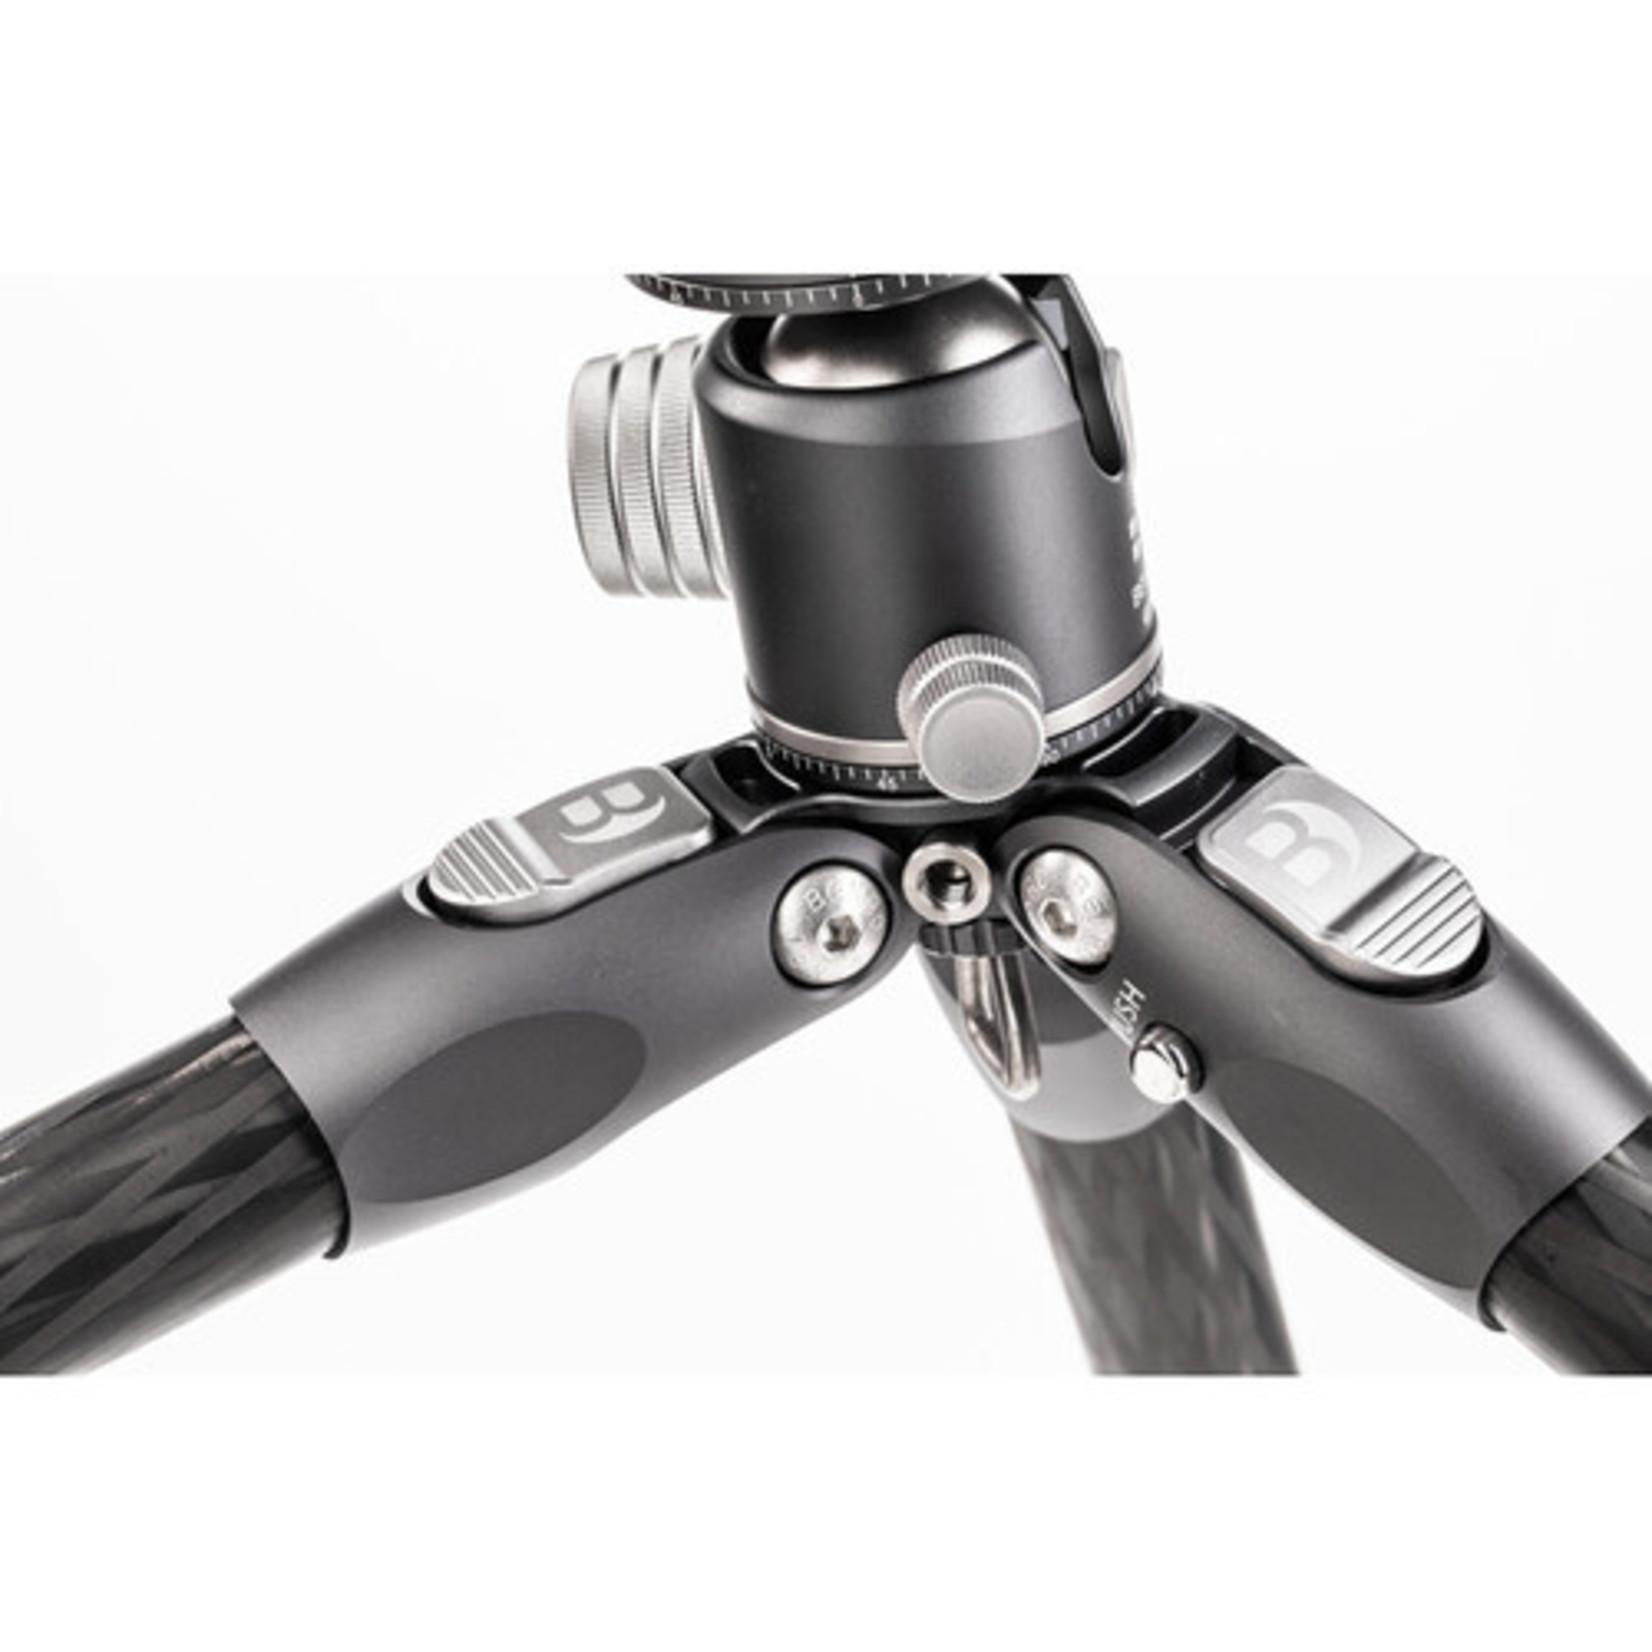 Benro Benro #3 Carbon Fiber TTOR35C+GX35